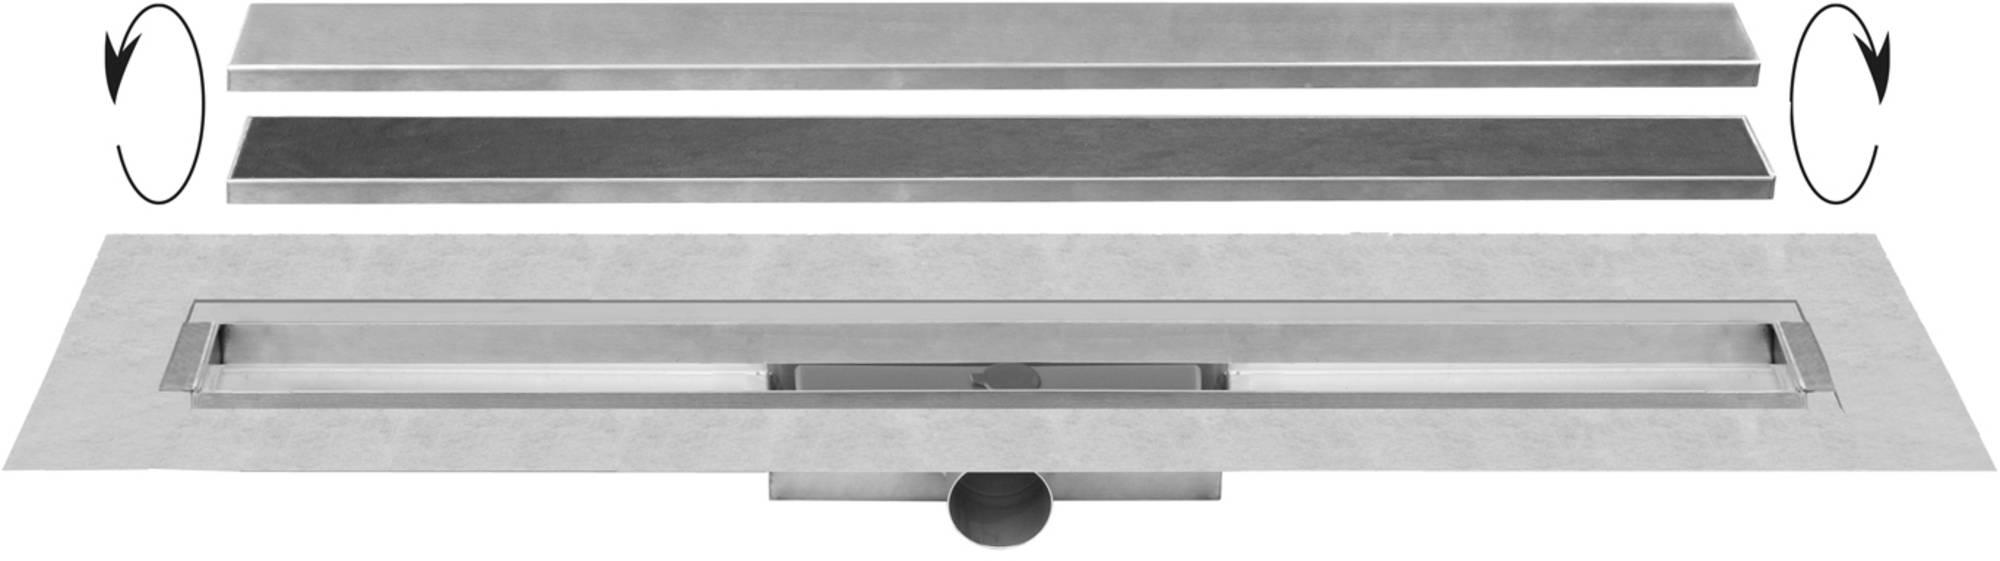 Easy Drain Compact 30 TAF Wall afvoergoot 90 x 6 cm. zijaansluiting Rvs